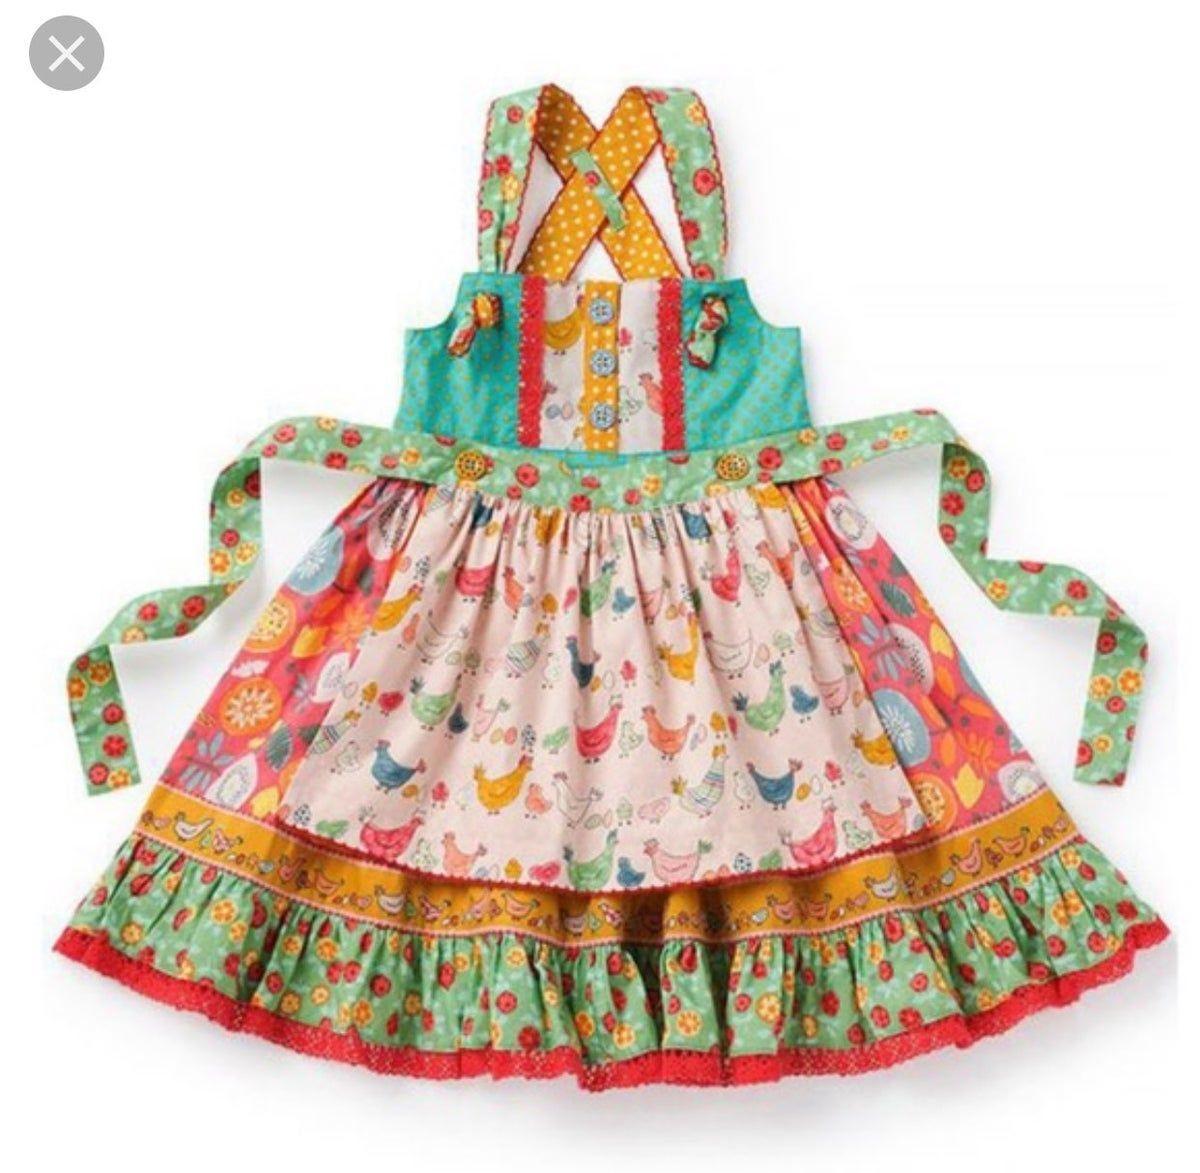 Matilda Jane Wish You Were Here Gotta Jet Maxi Girls dress size 12 NWT